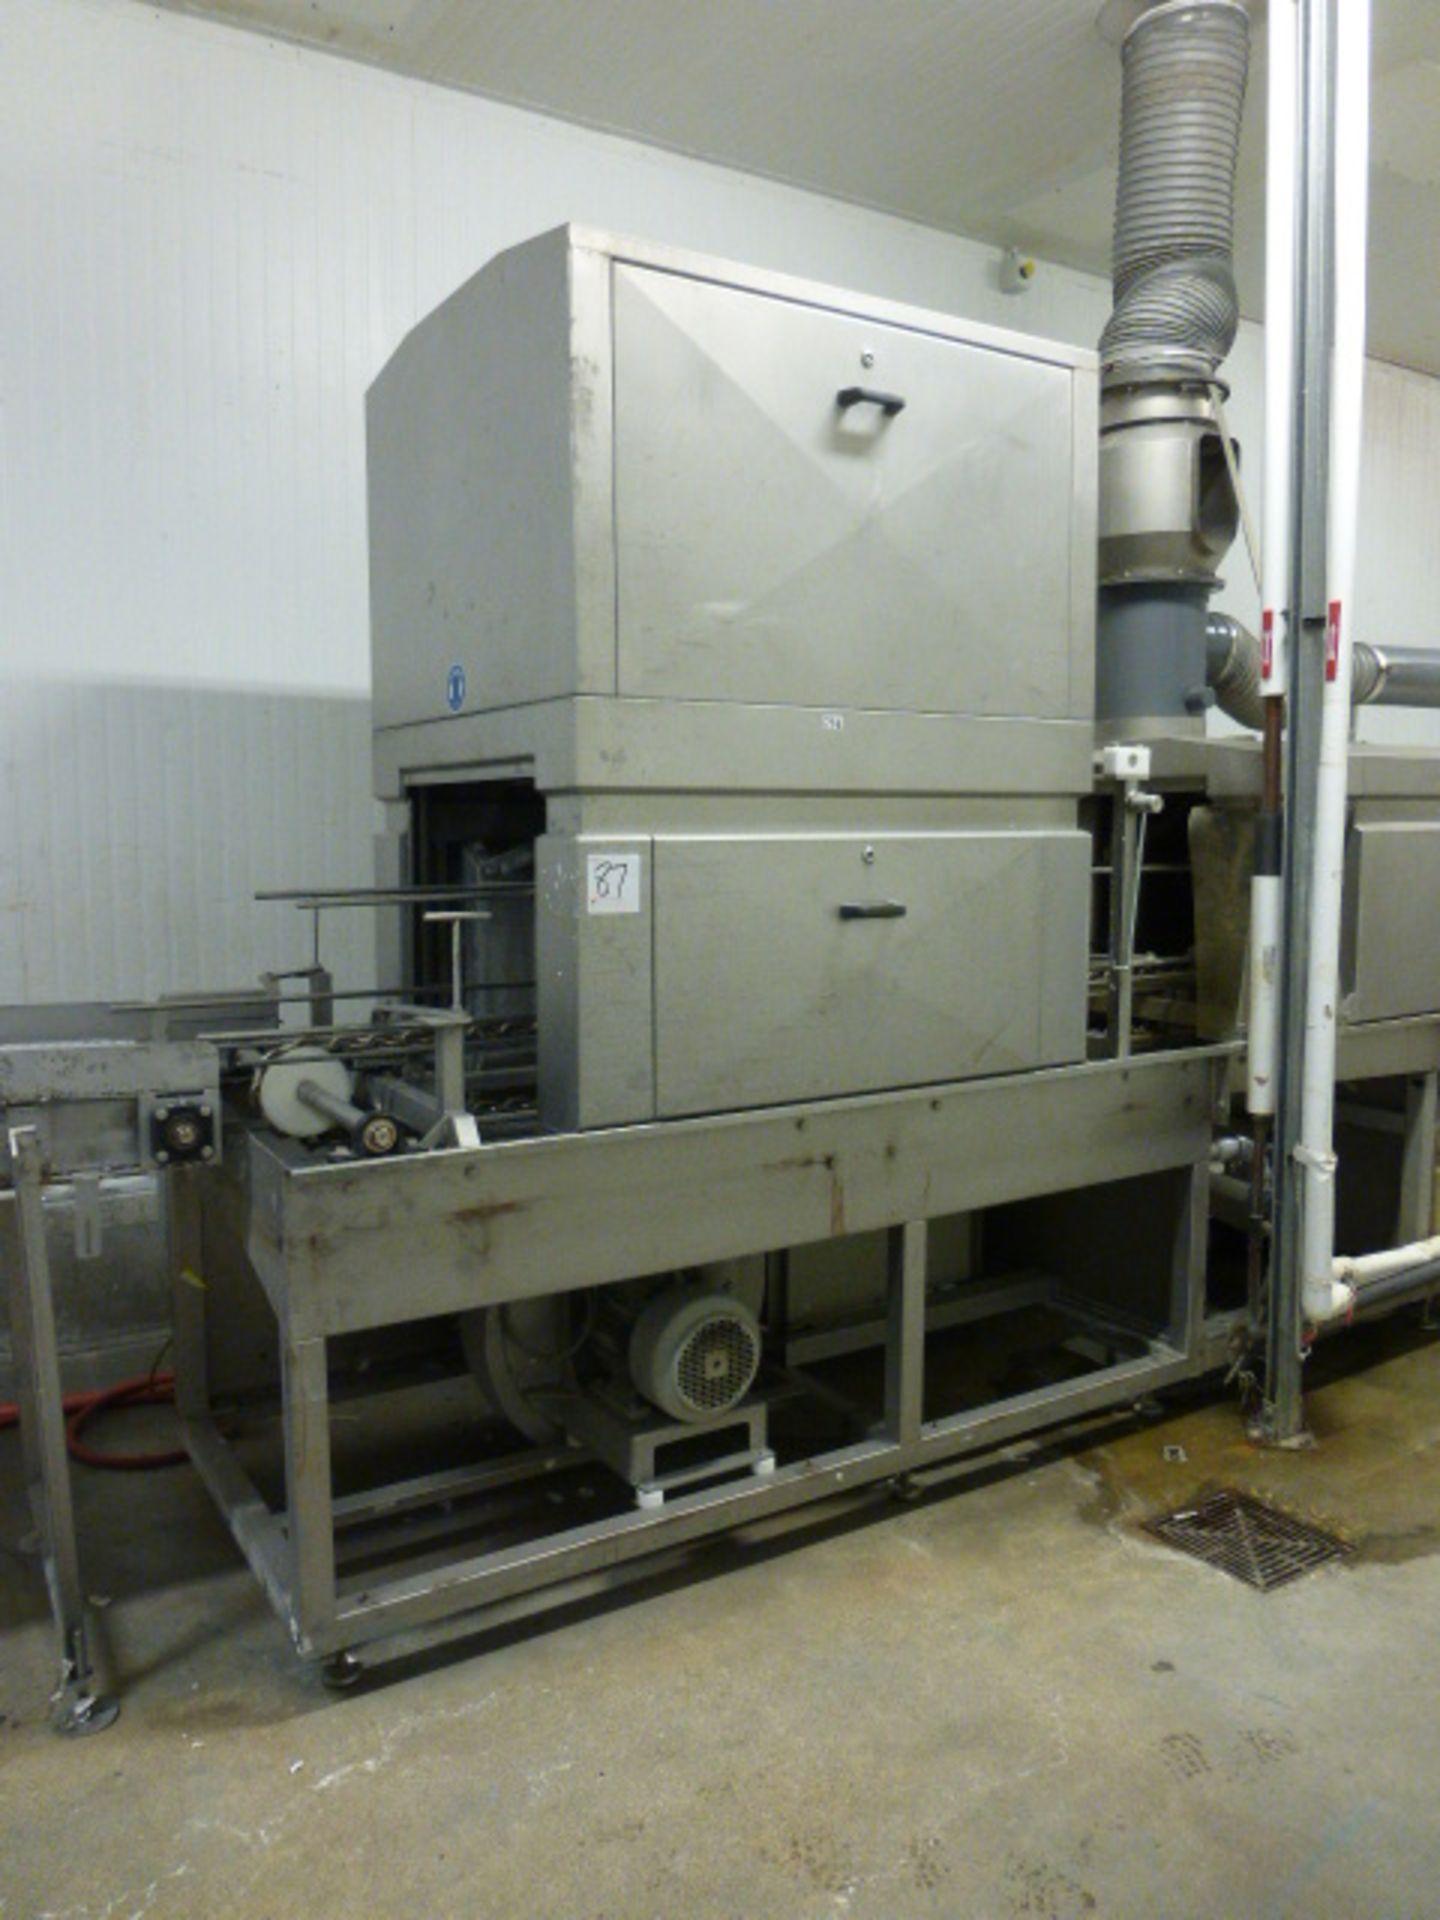 Lot 87 - Systemate Numafa tray washer, type 19.50.007.500, s/n 707145